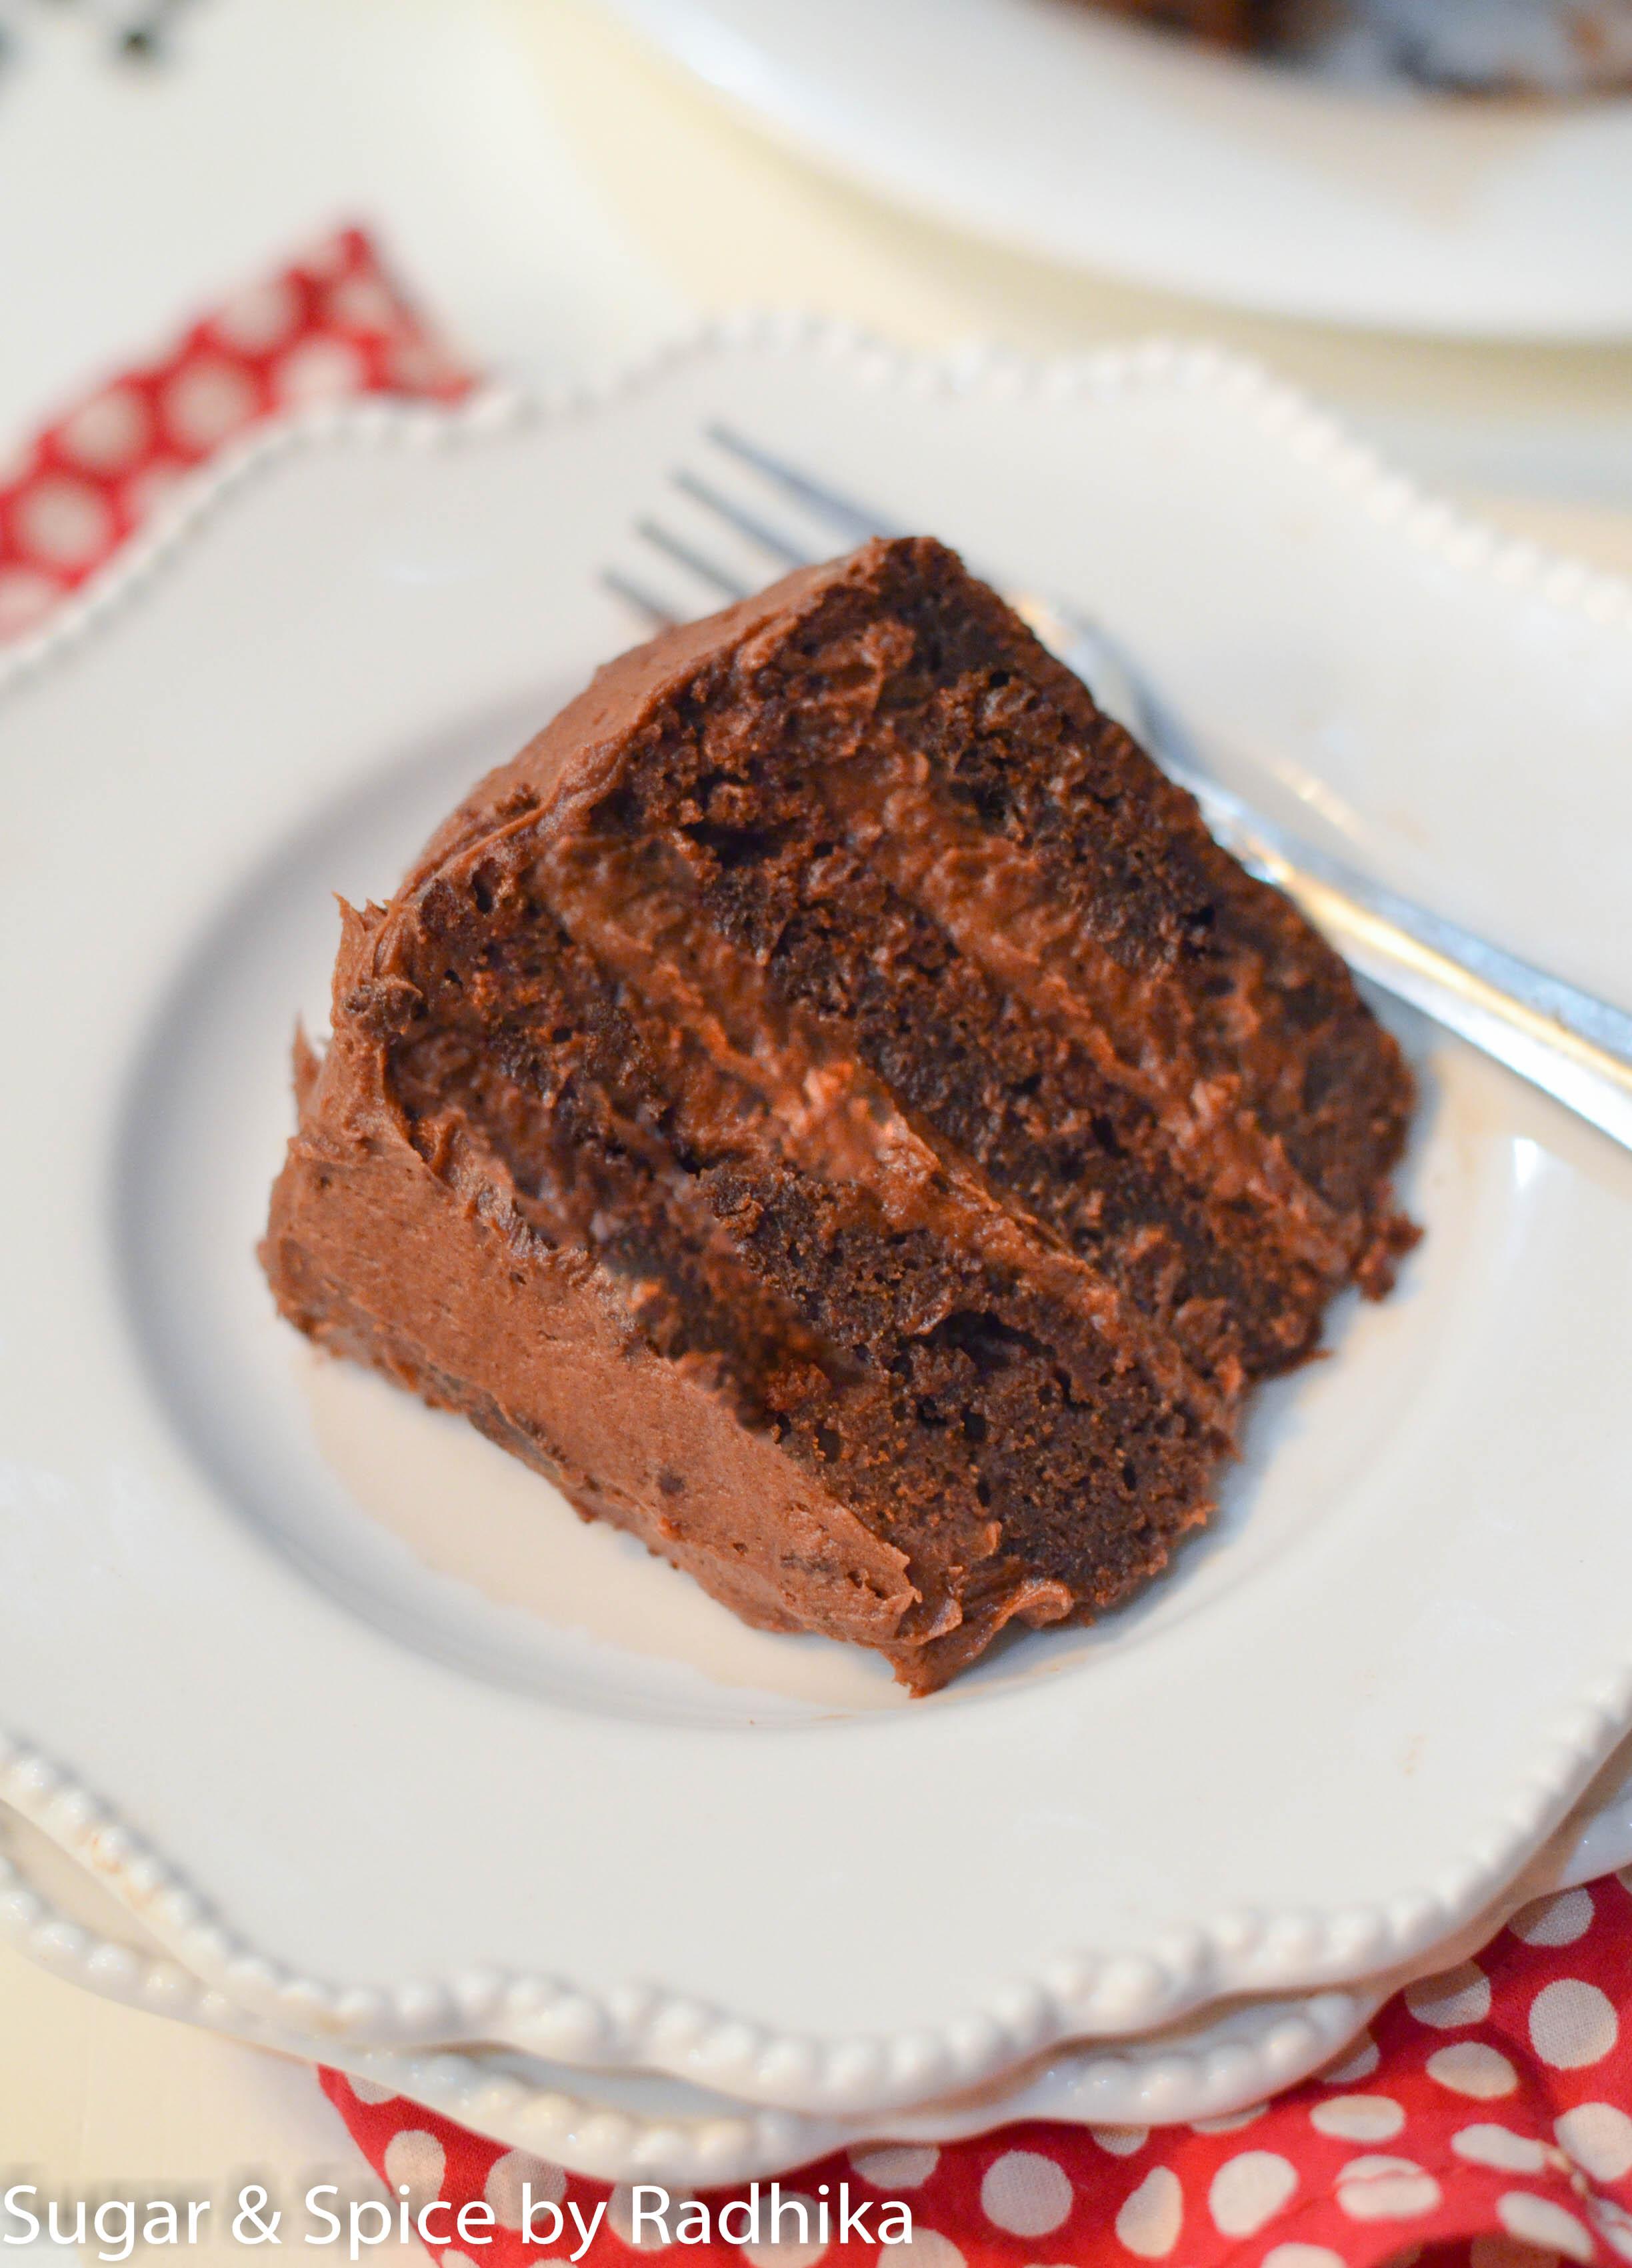 Hershey's Chocolate Cake with Chocolate Frosting Recipe |